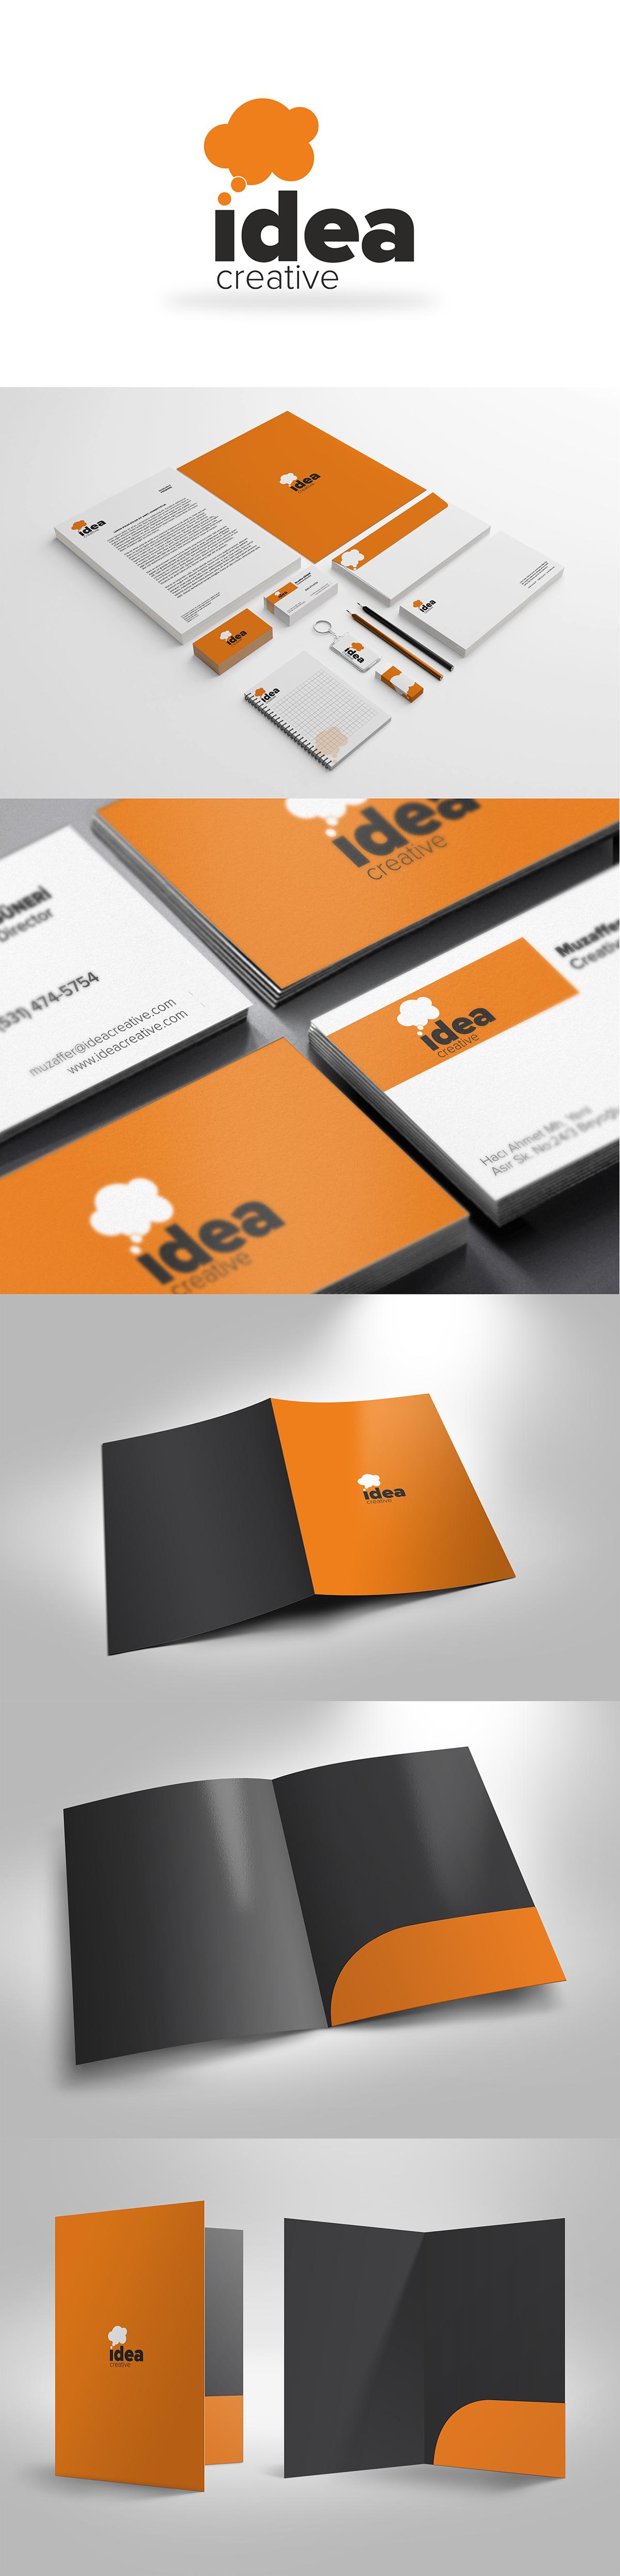 idea creative agency ajans reklam kurumsal kimlik branding